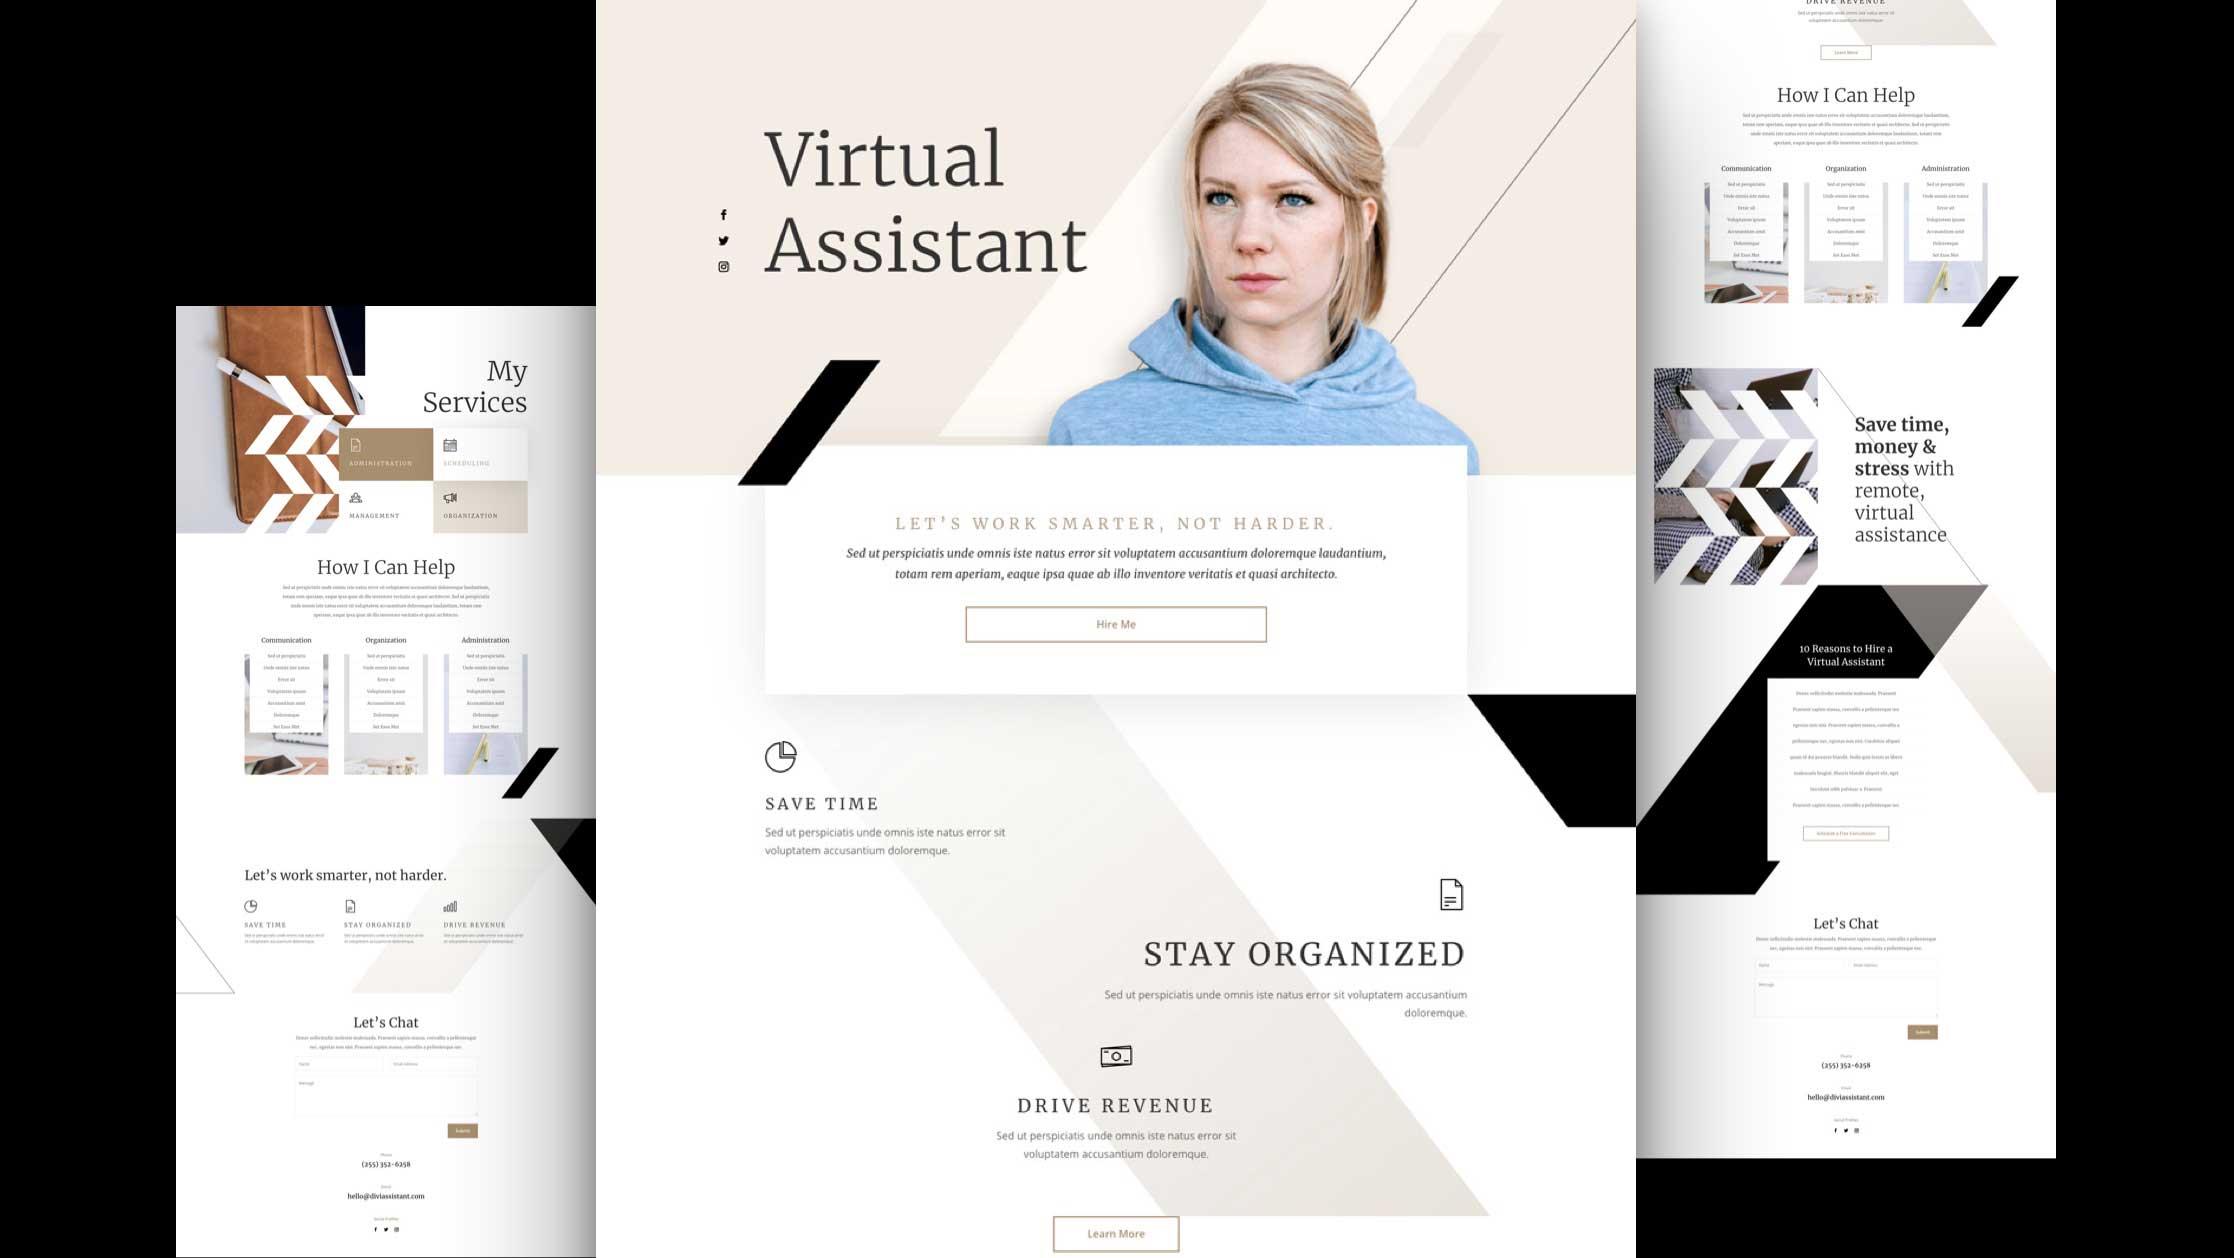 virtuelle-assistentin-divi-kostenloses-layout-pack